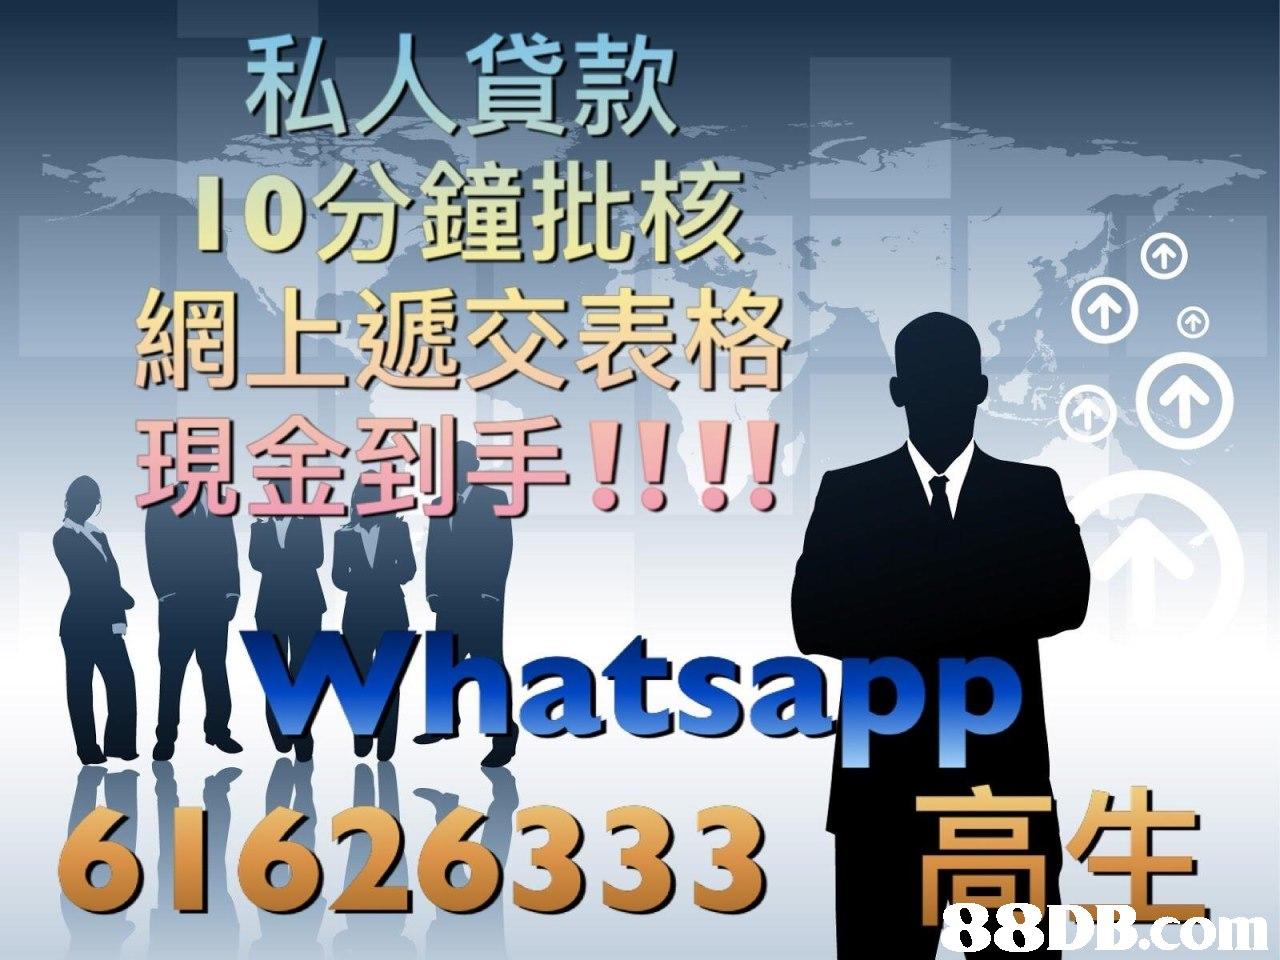 "代士 小/ , 10分鐘批核 網上遞交表格, g."" Whatsapp 61626333 高生 88DB.co In  Font,"